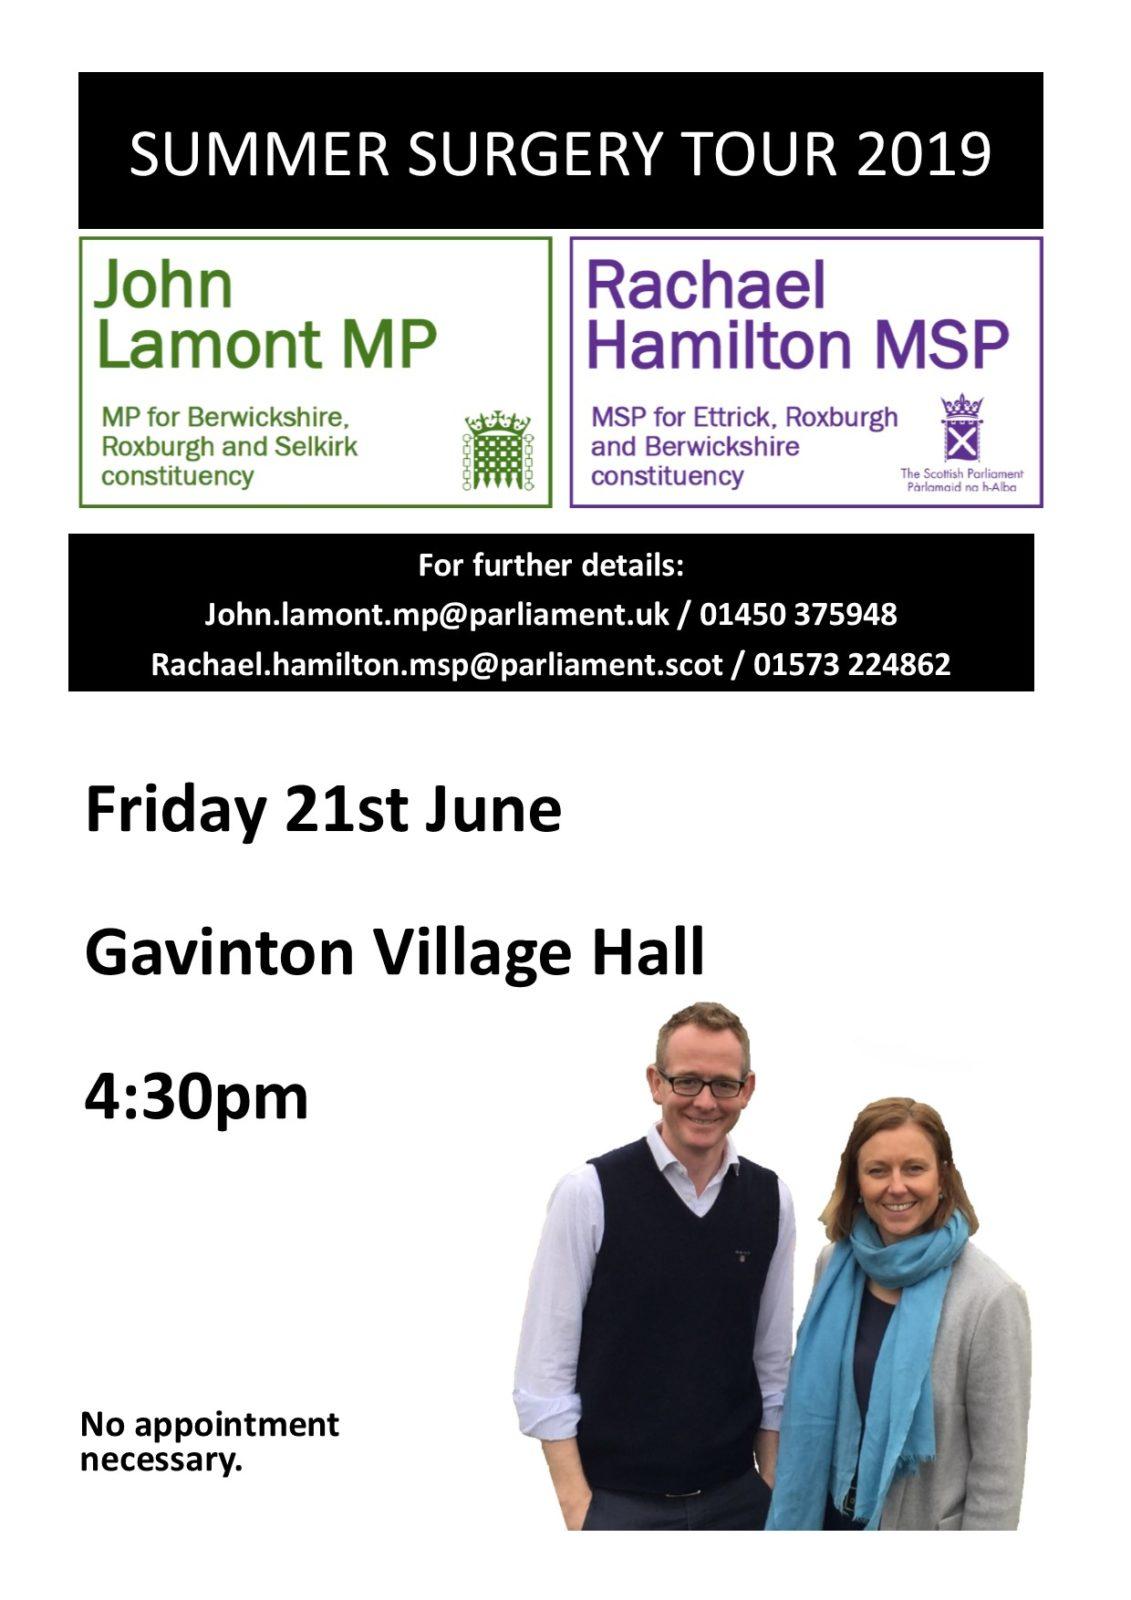 John Lamont MP and Rachael Hamilton MSP surgery meeting